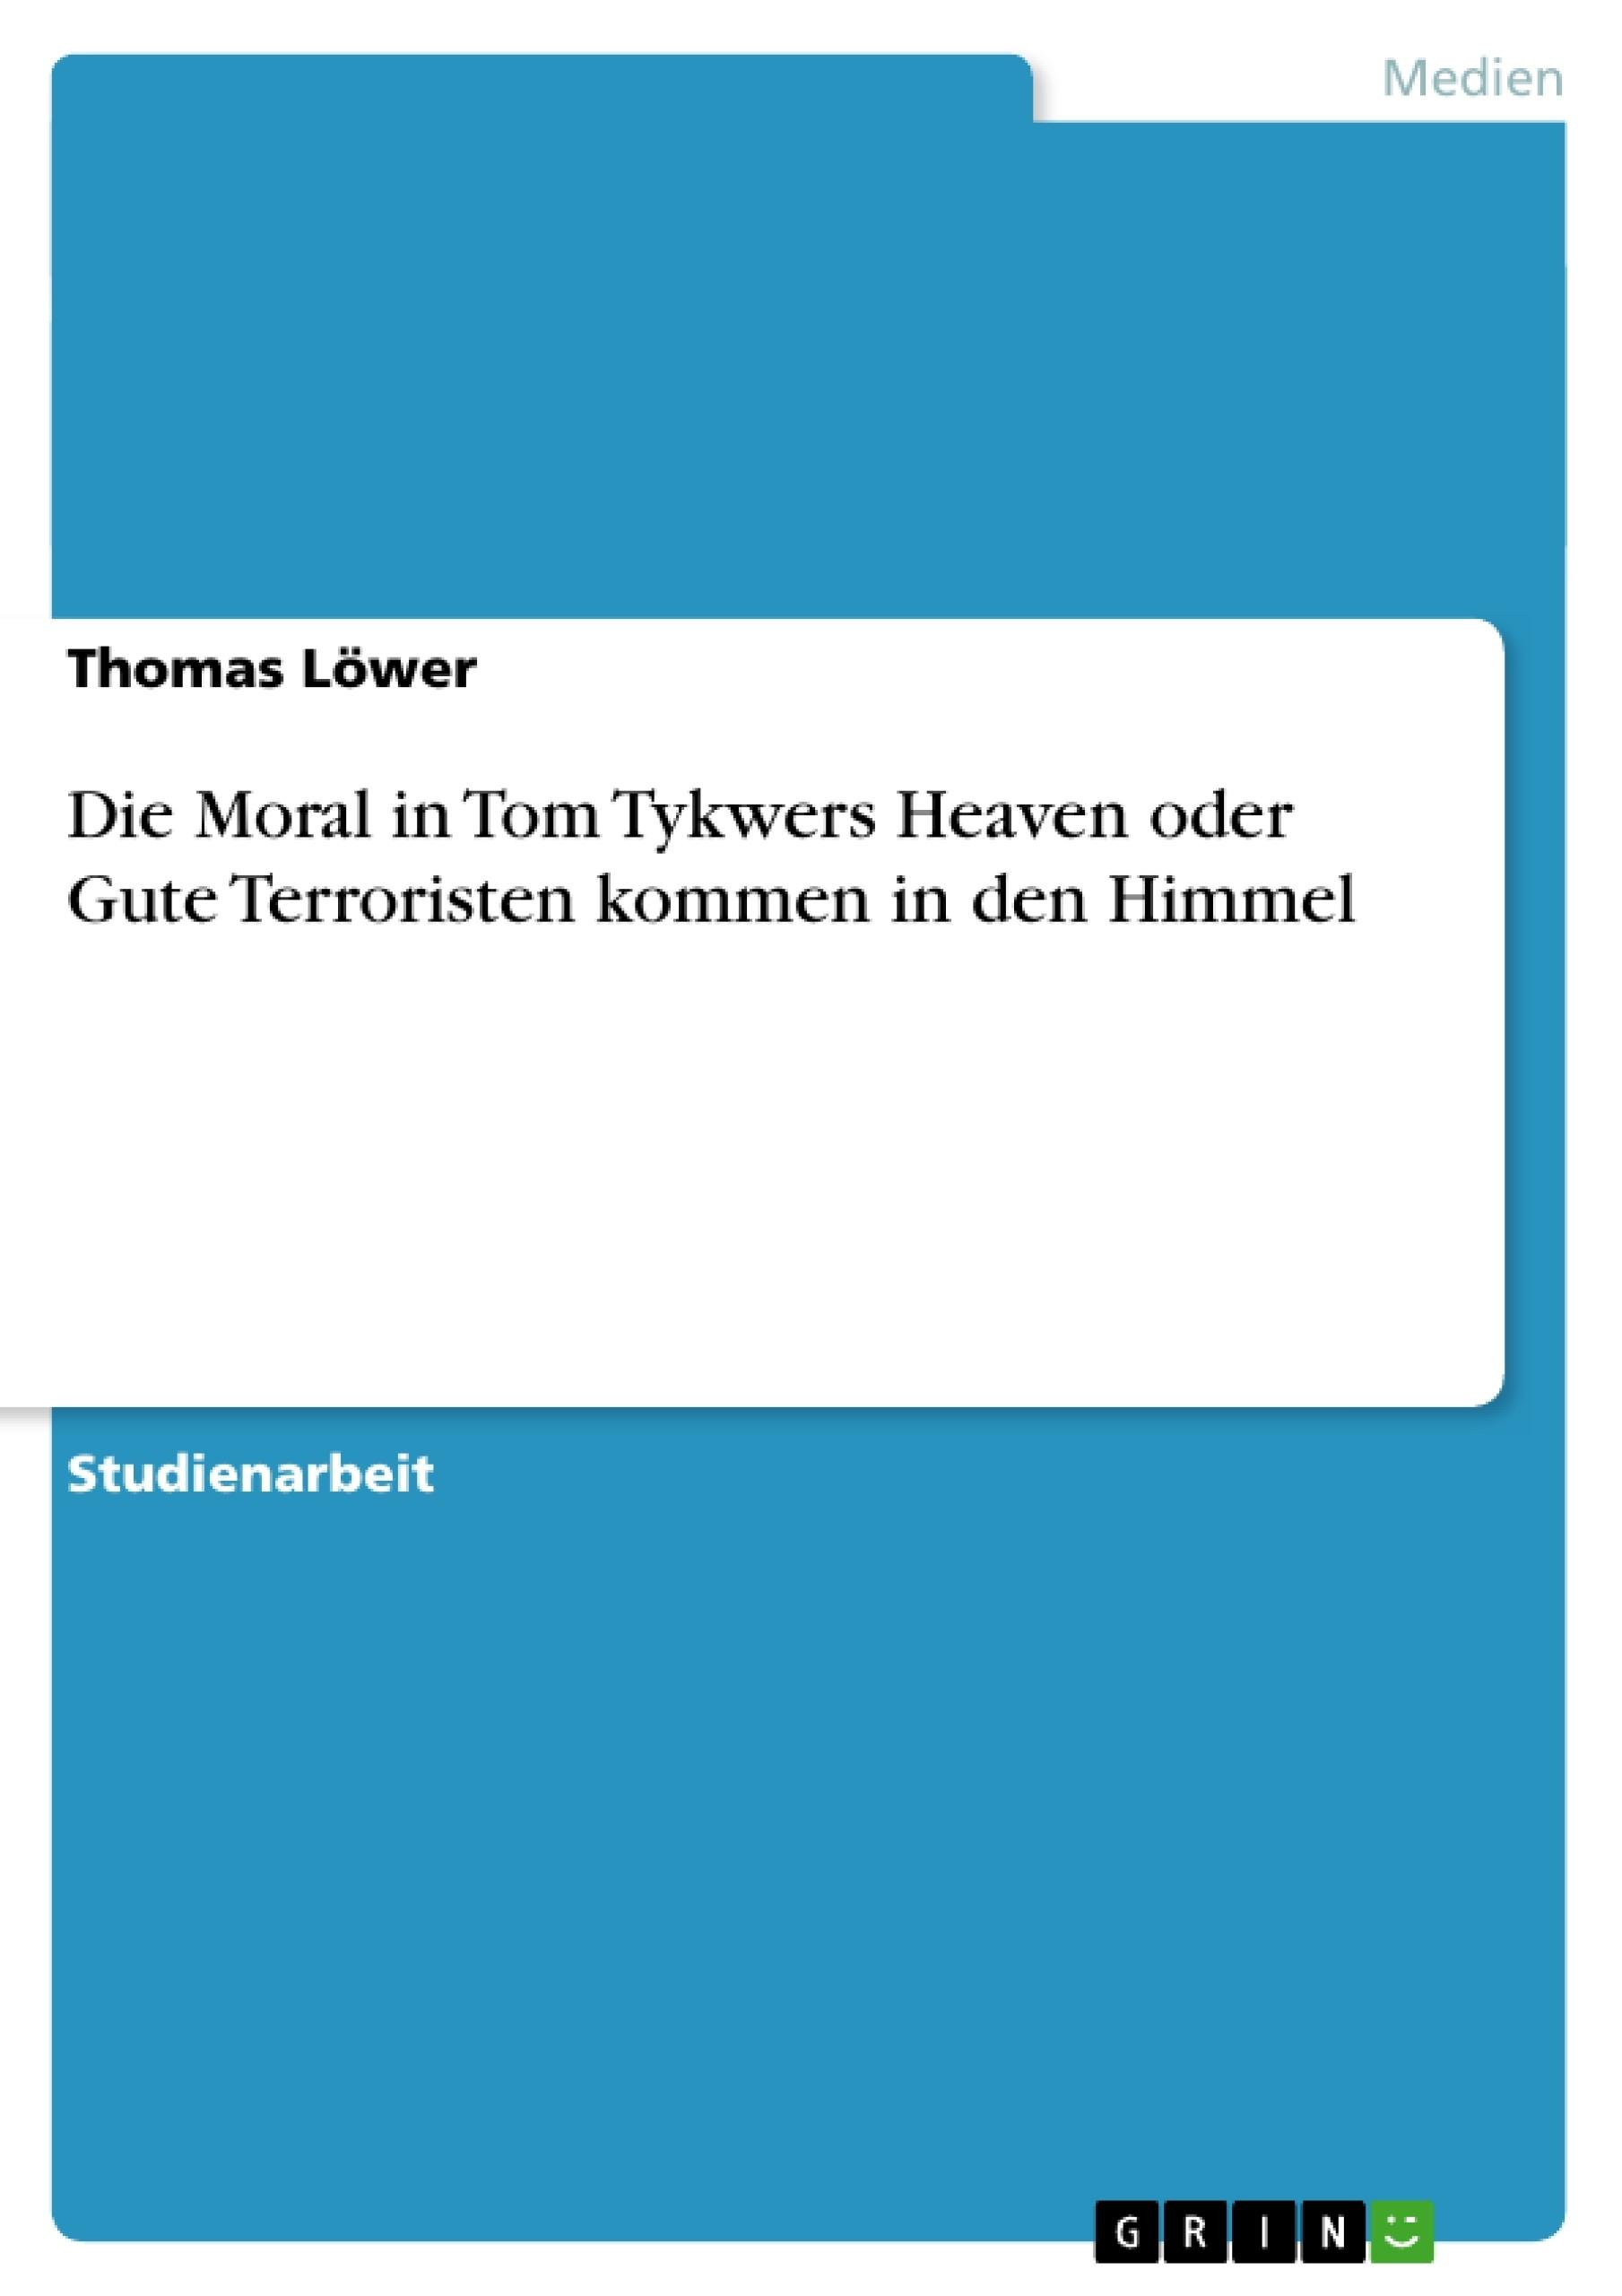 Titel: Die Moral in Tom Tykwers Heaven oder Gute Terroristen kommen in den Himmel